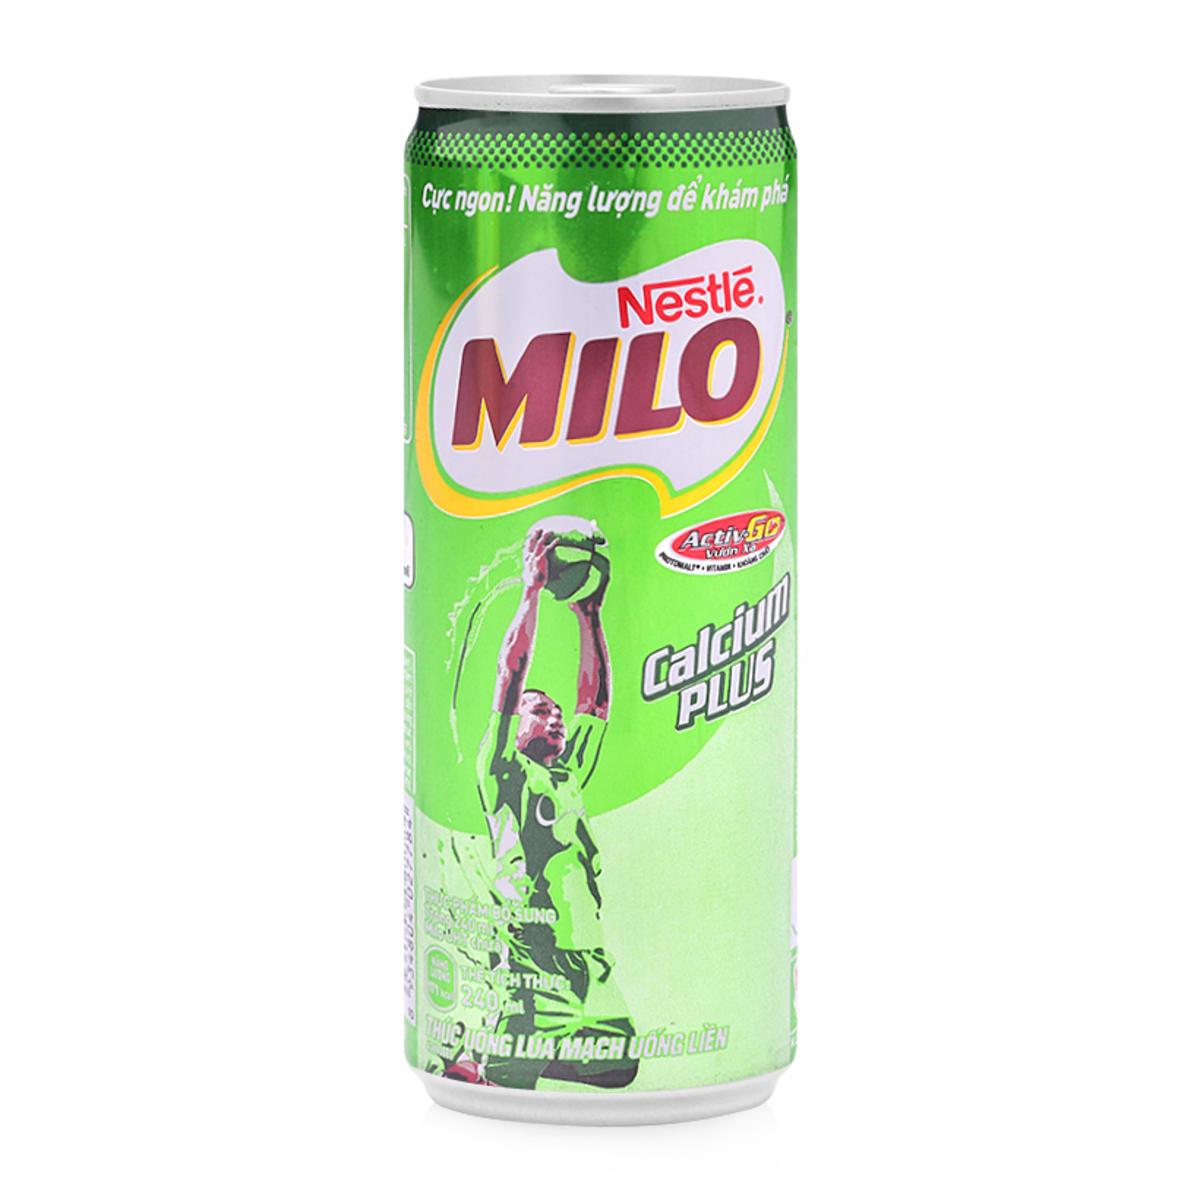 milo-chocolate-malt-flavor-drink-240ml